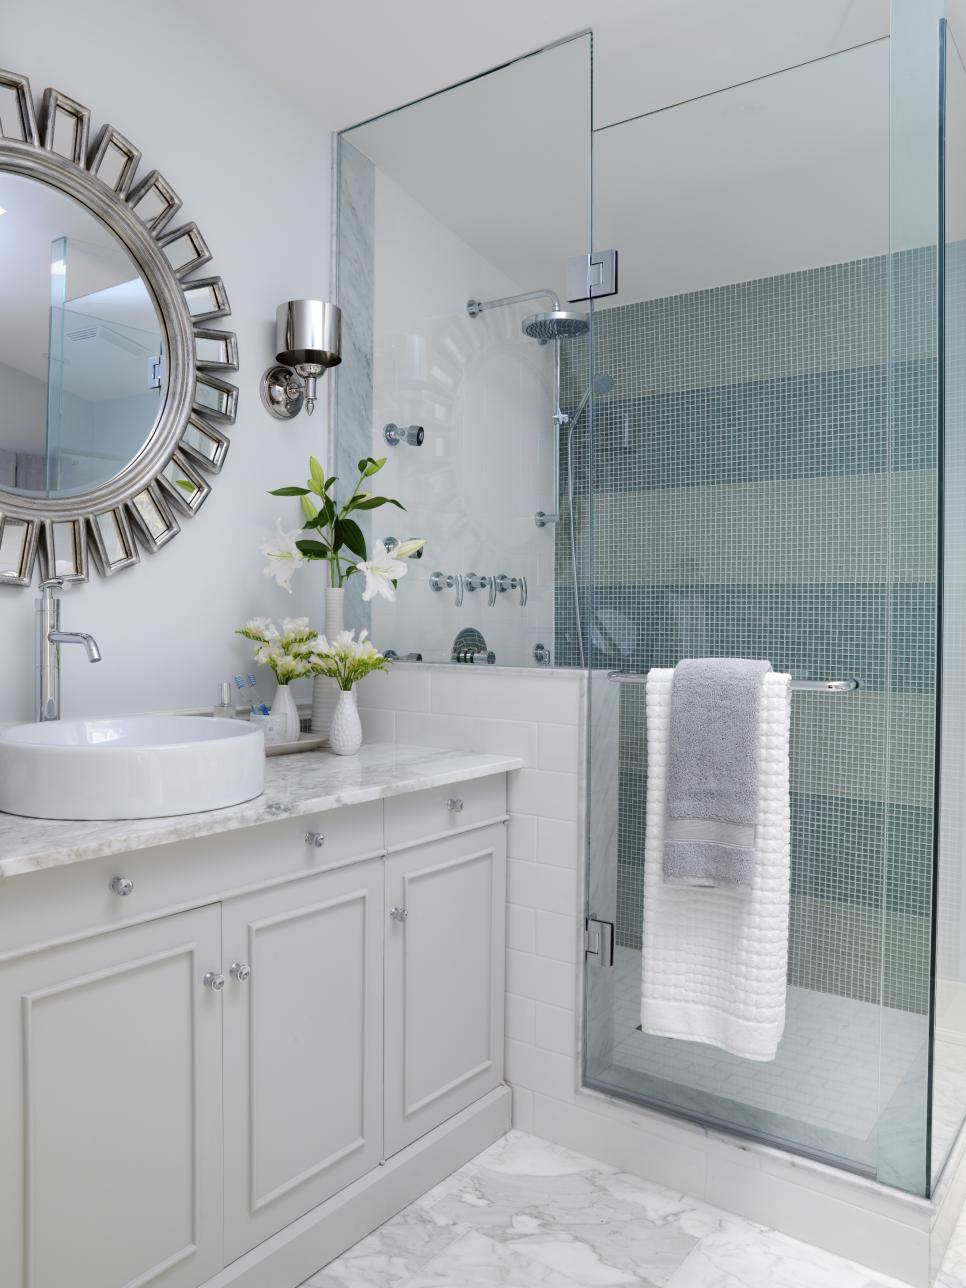 Astounding Bathroom Ideas Designs Hgtv Largest Home Design Picture Inspirations Pitcheantrous